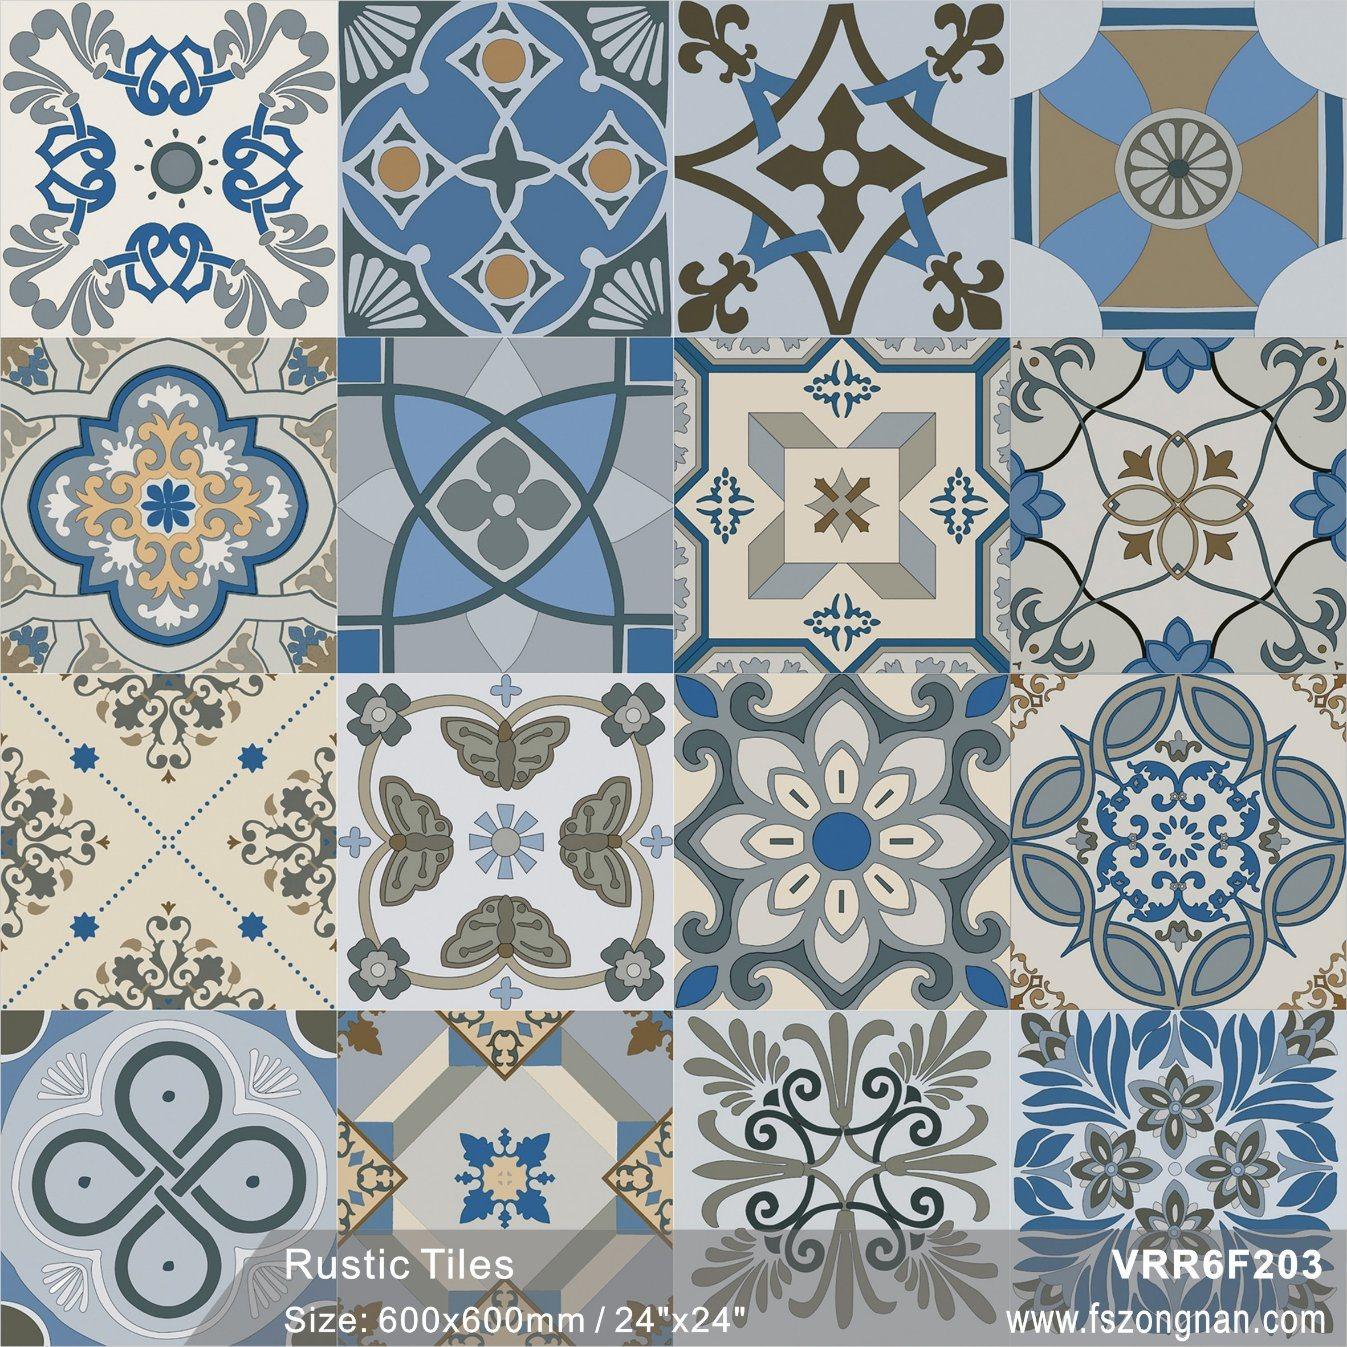 China Building Material Retro Tiles Pattern Rustic Porcelain Tile ...